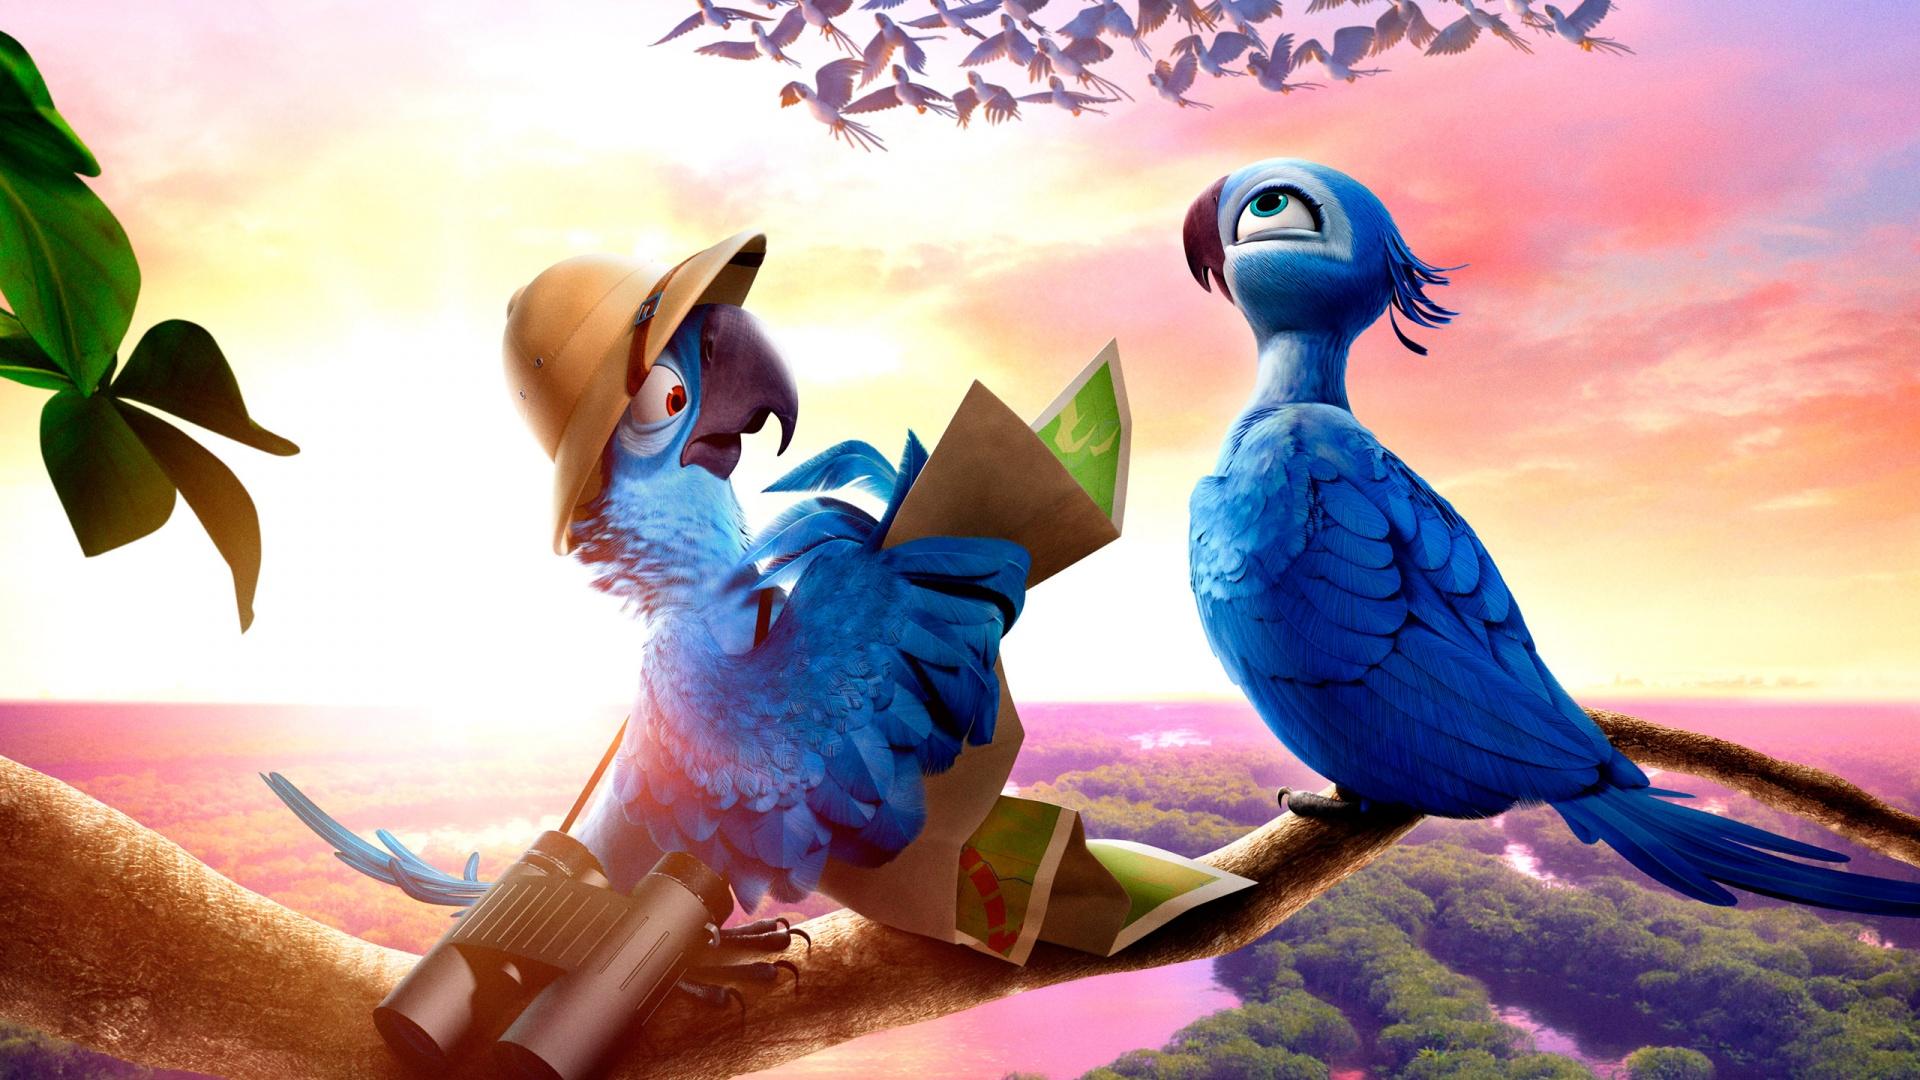 Rio 2 Movie Wallpaper Rio 2 | Movie fanart |...